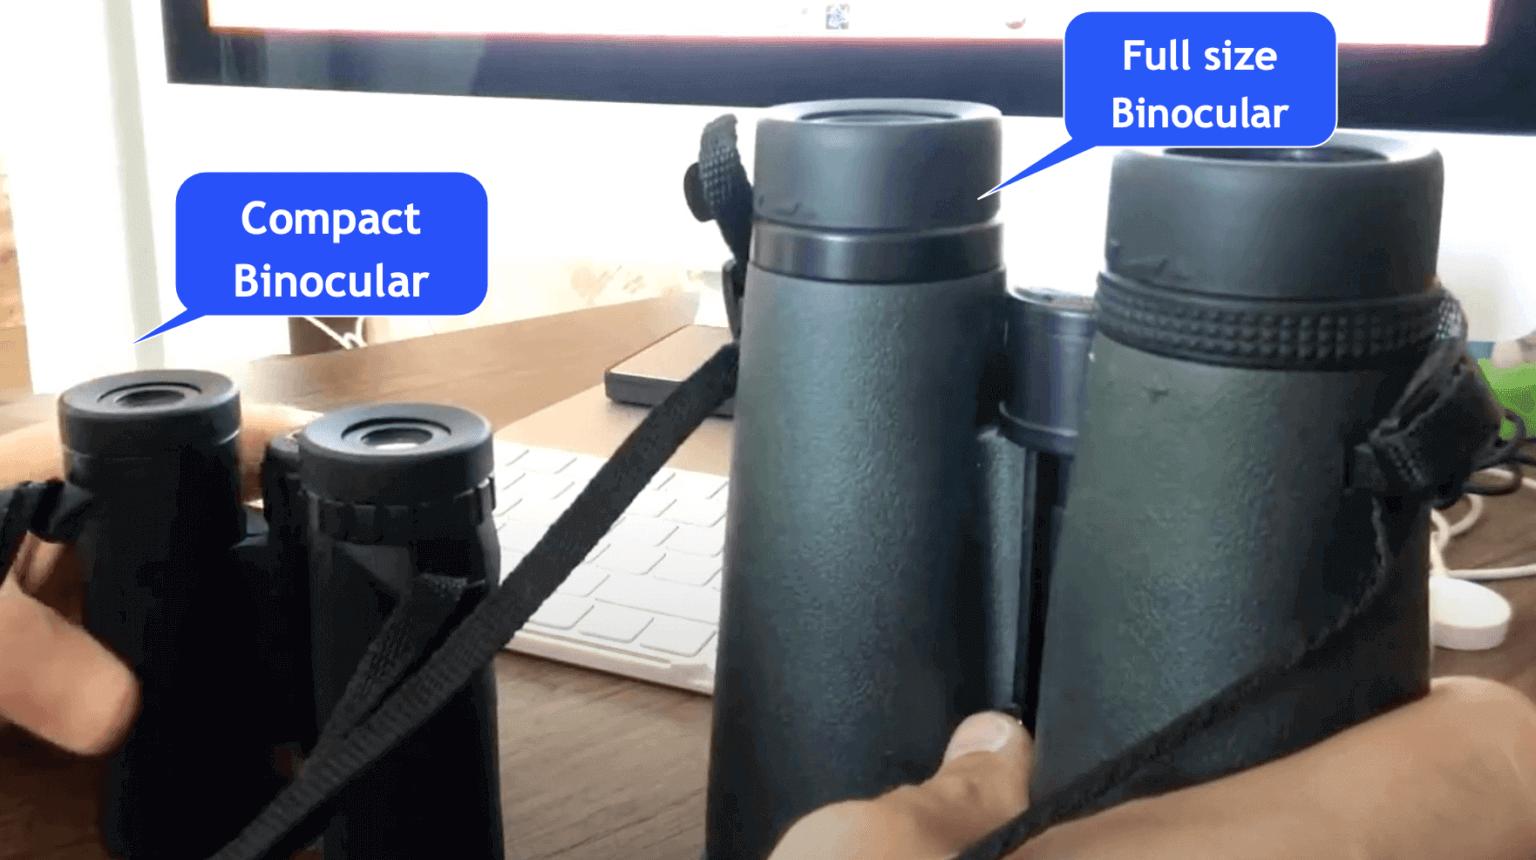 compact-and-full-size-binoculars